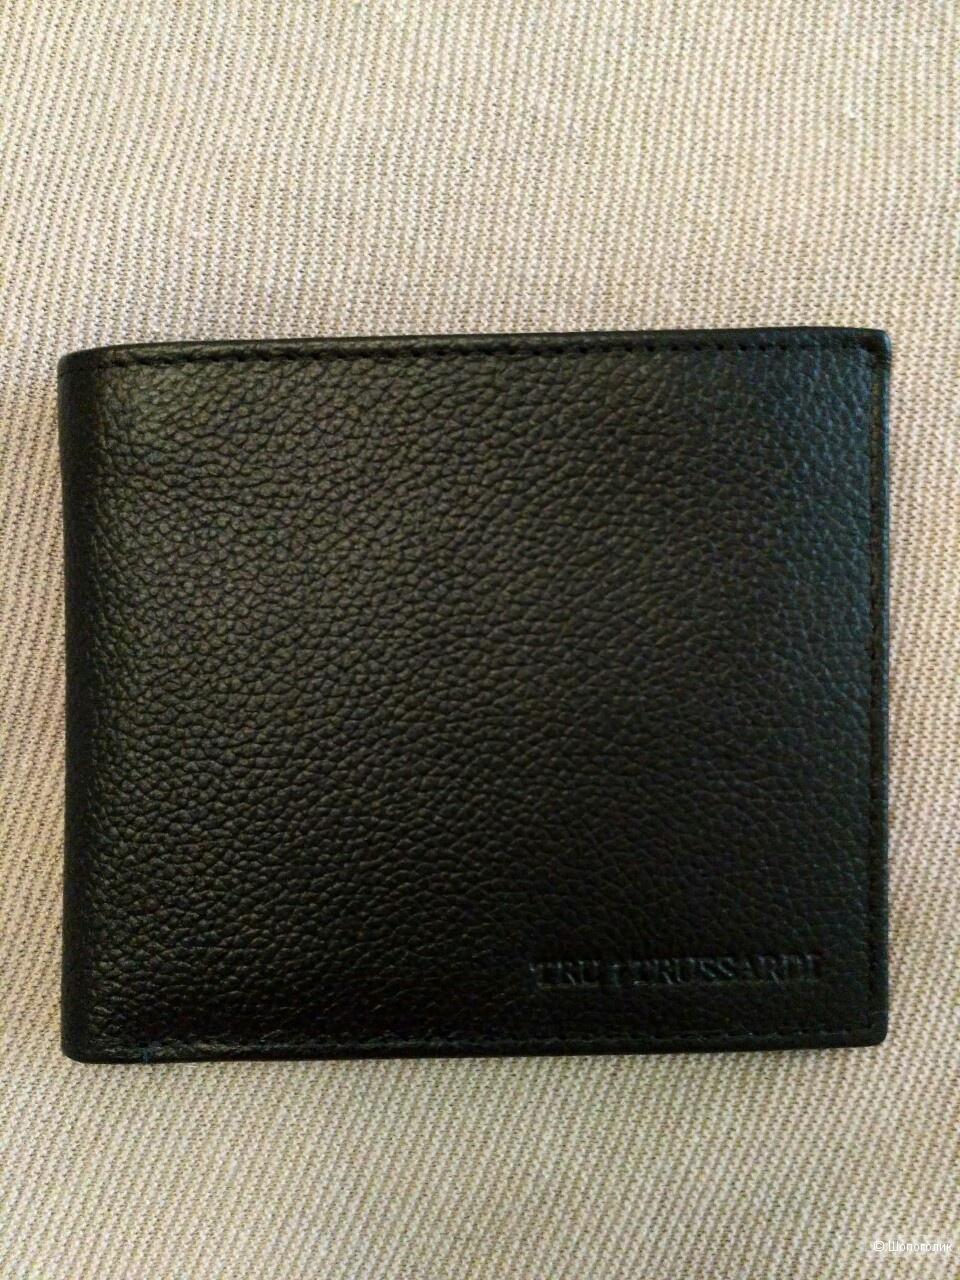 Бумажник Tru Trussardi, one size